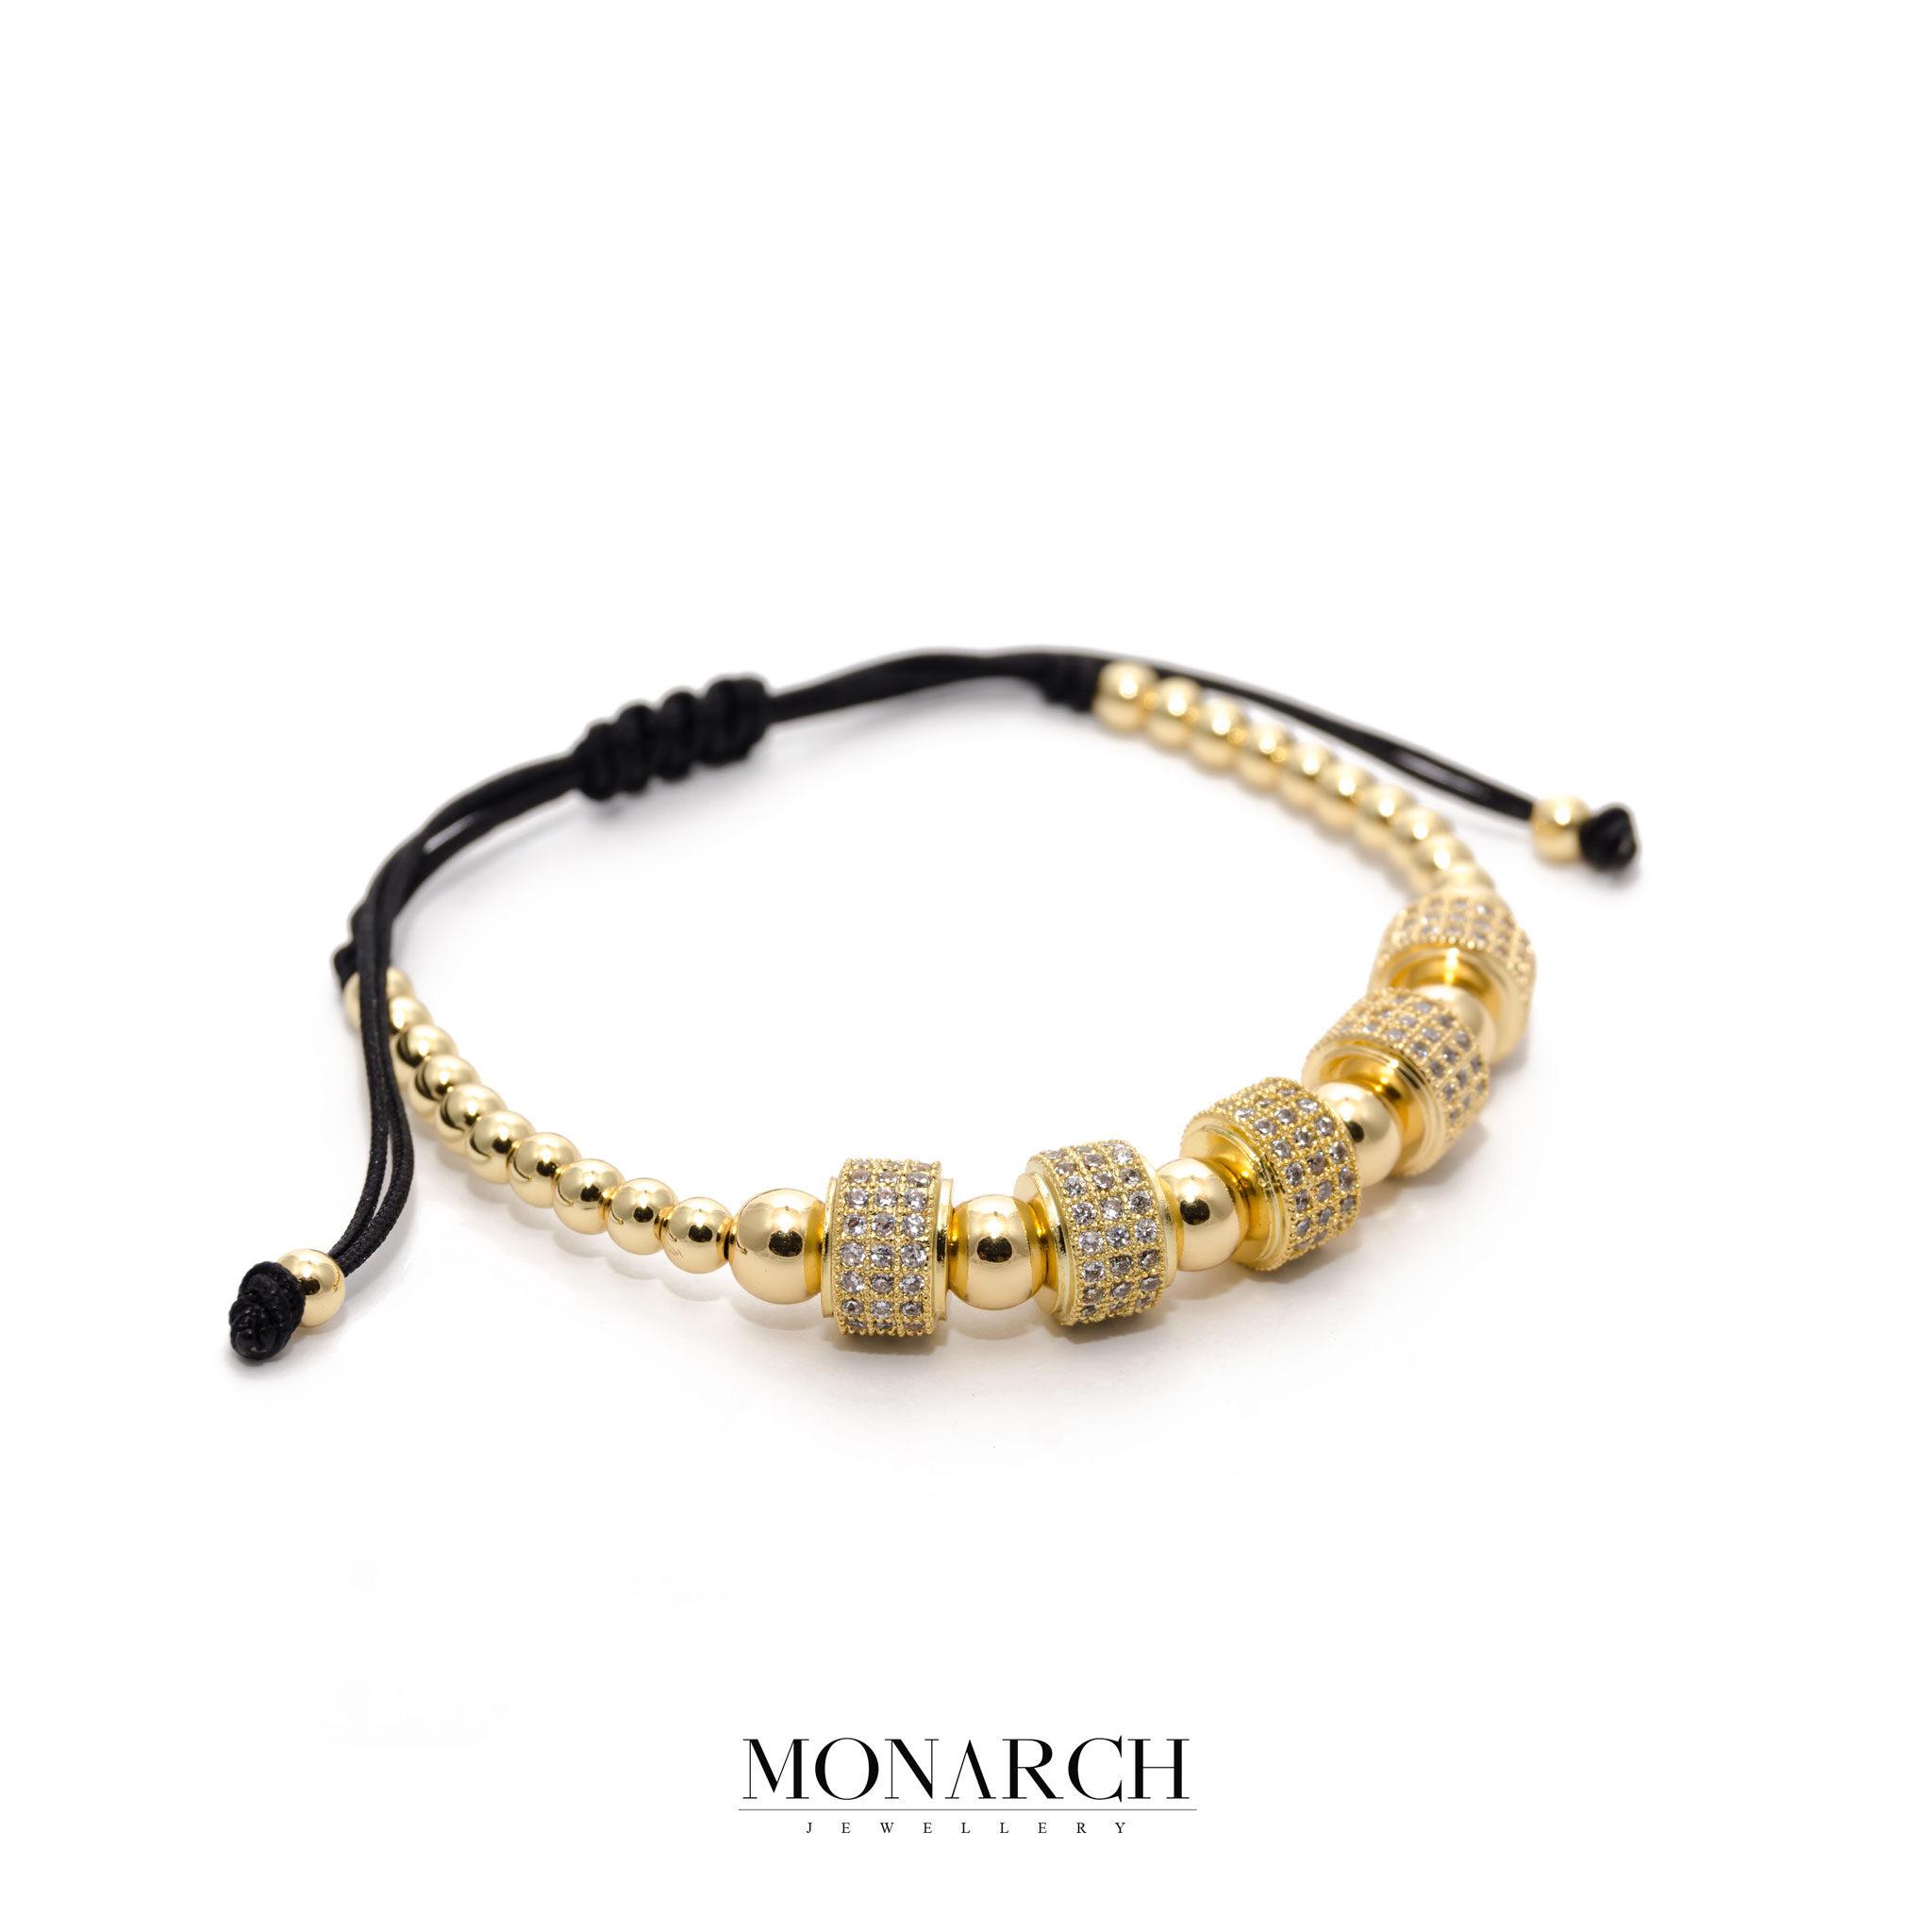 24K Gold White Penta Circum Bracelet